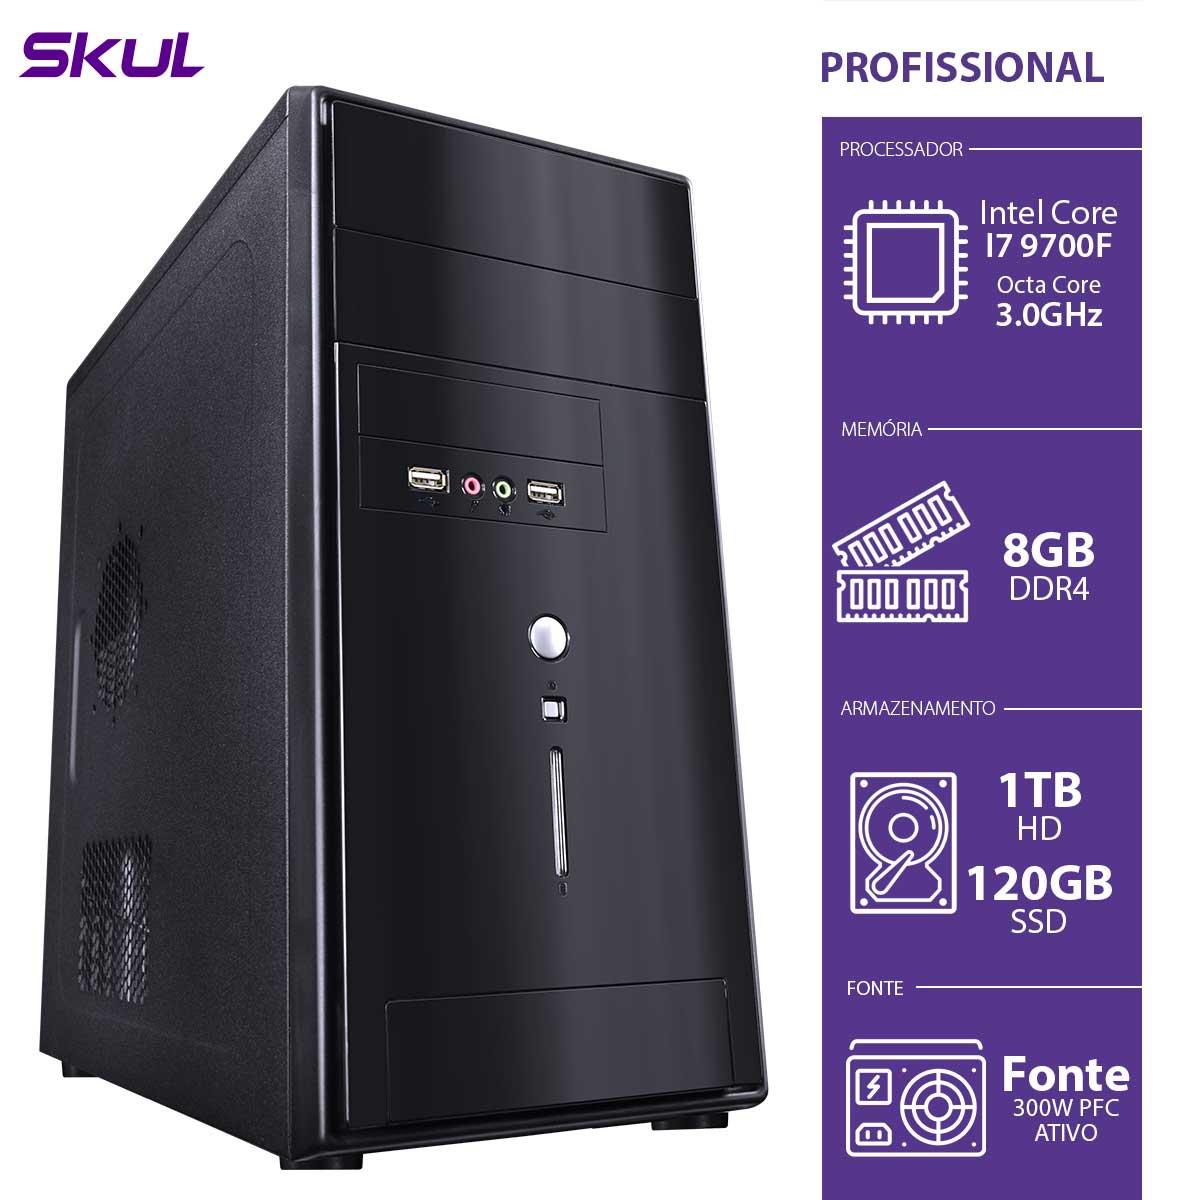 Computador Profissional P500 - I7-9700F 3.0GHZ MEM 8GB DDR4 SSD 120GB HD 1TB sem Video Integrado Fonte 300W PFC Ativo